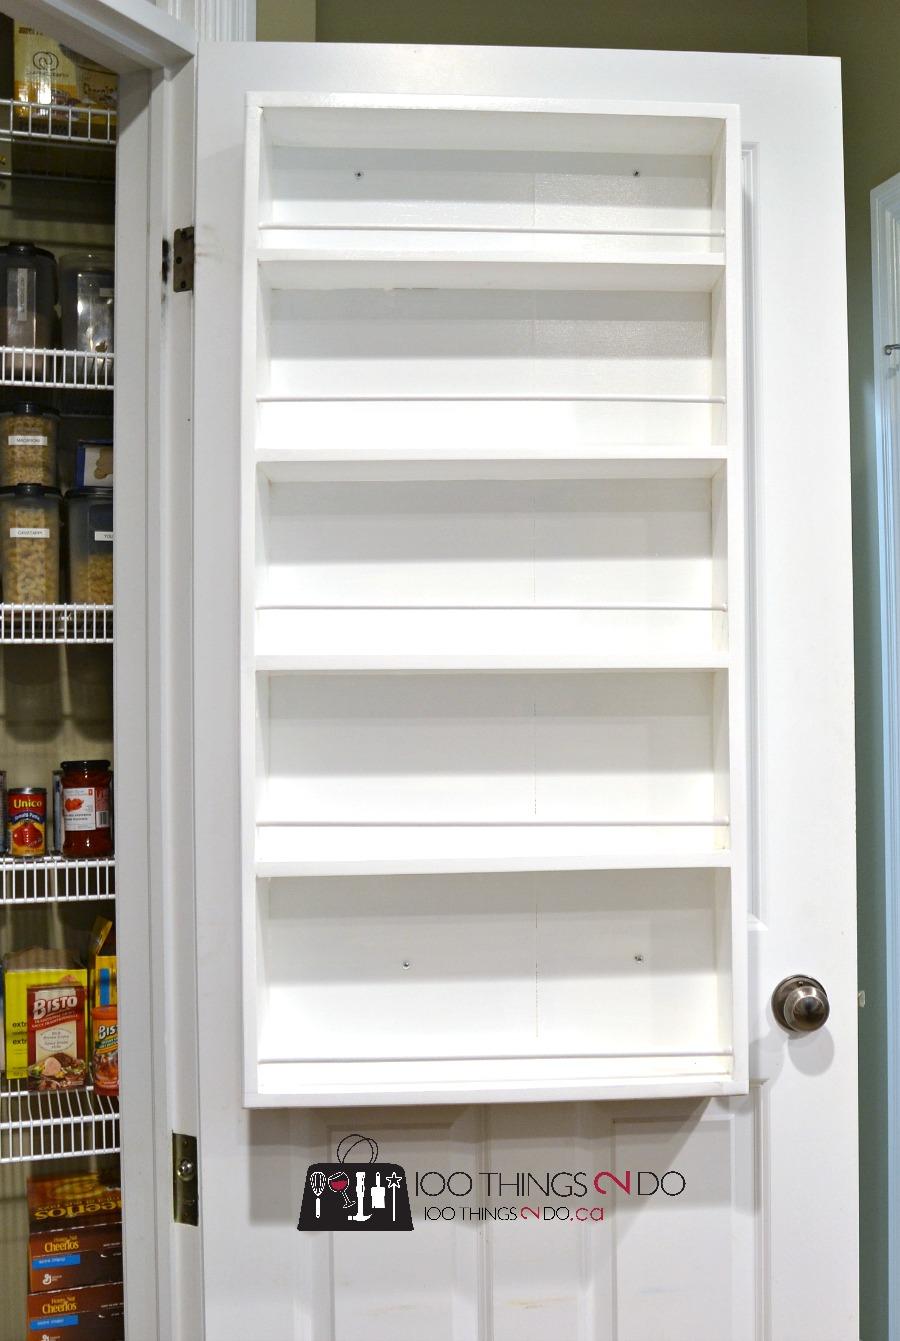 DIY Door Mounted Spice Rack - 100 Things 2 Do